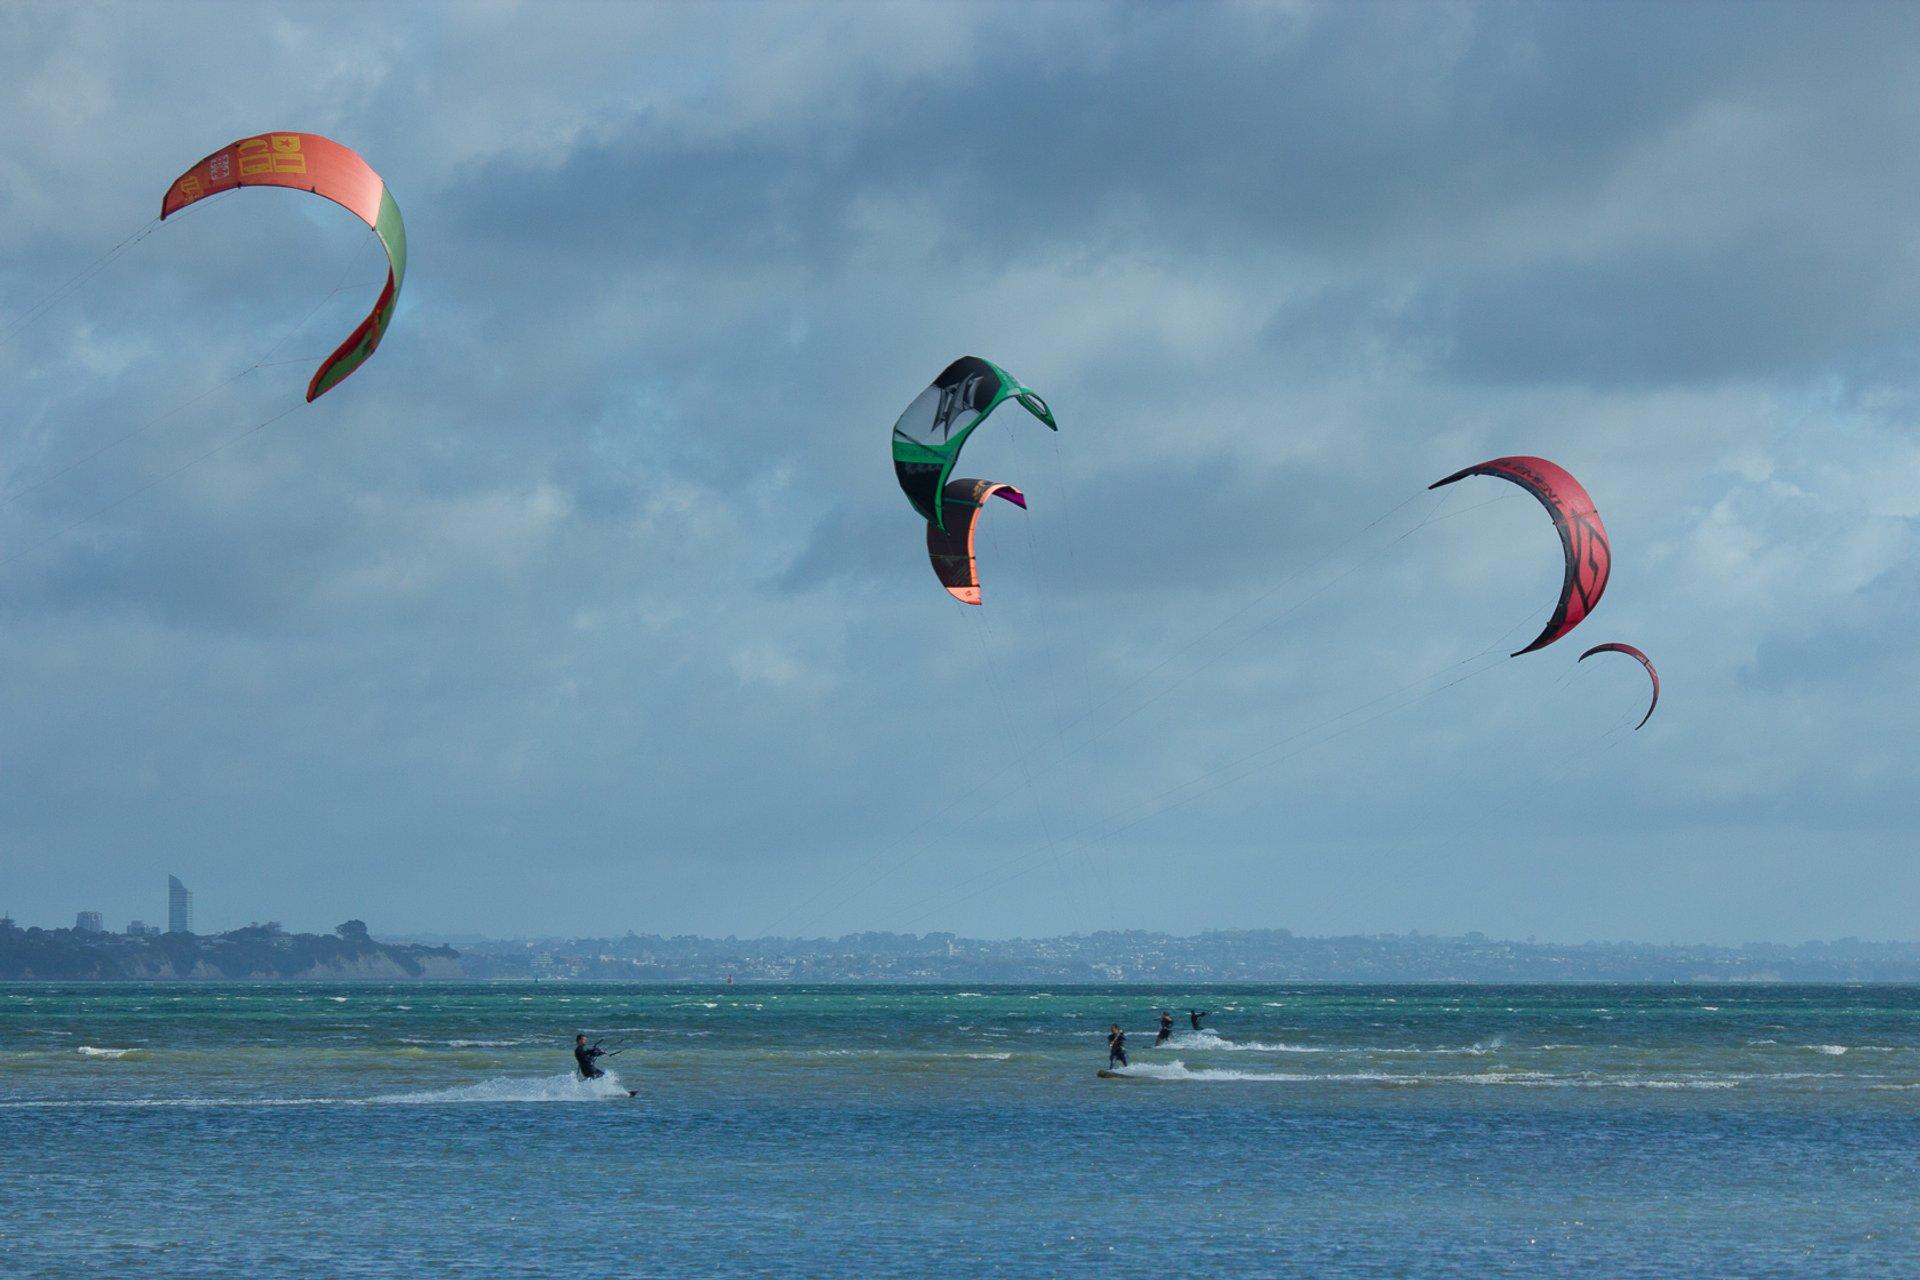 Kitesurfing & Windsurfing in New Zealand 2020 - Best Time